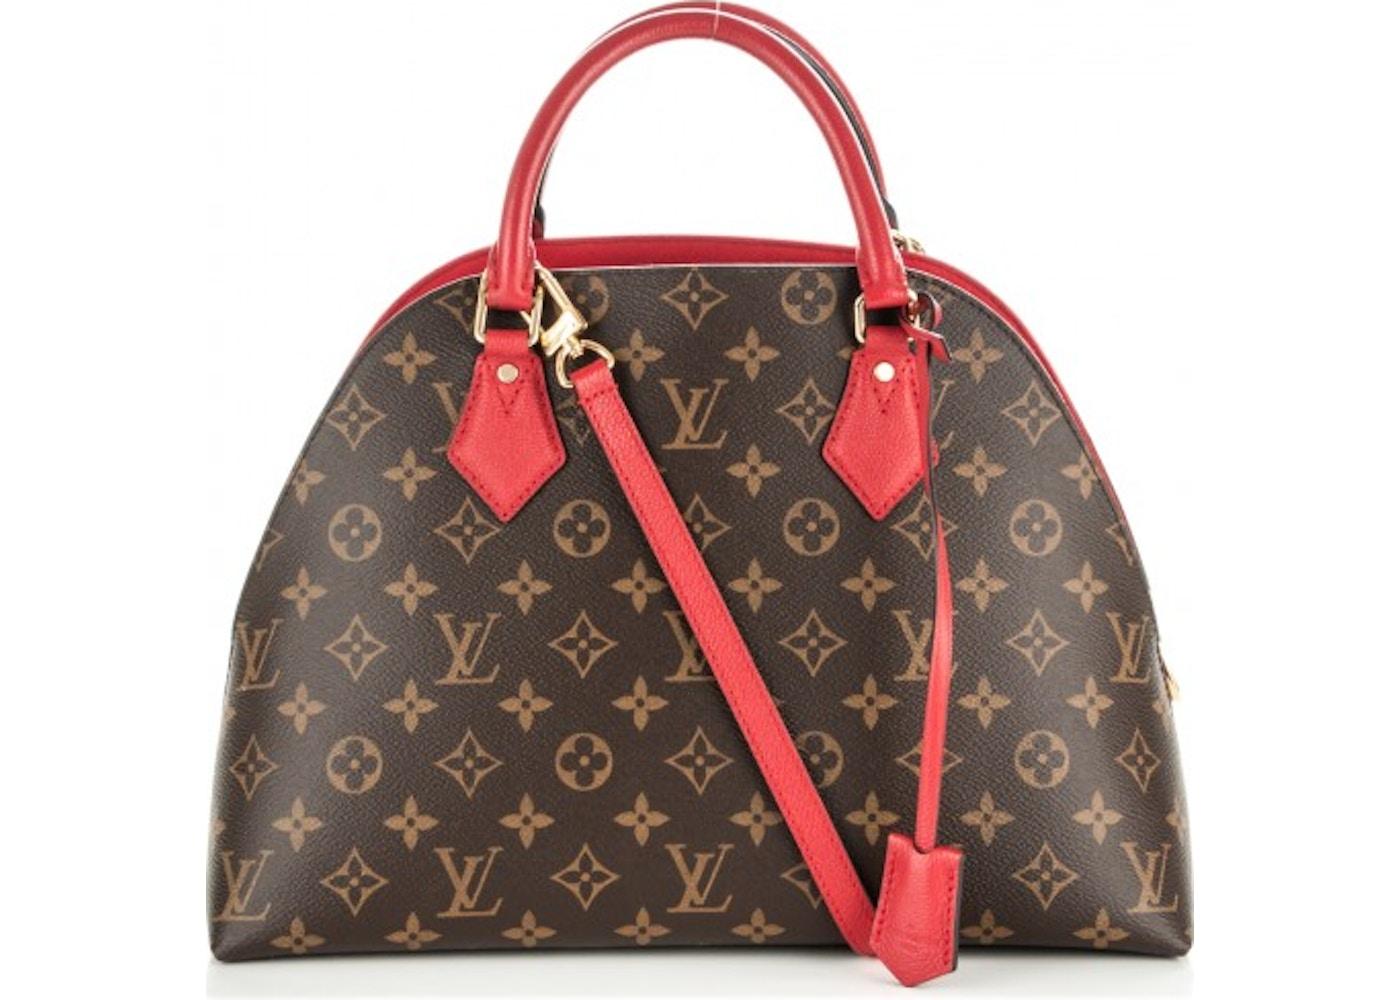 Louis Vuitton Crossbody Alma B N B Monogram With Accessories ... f61c72c146aa9